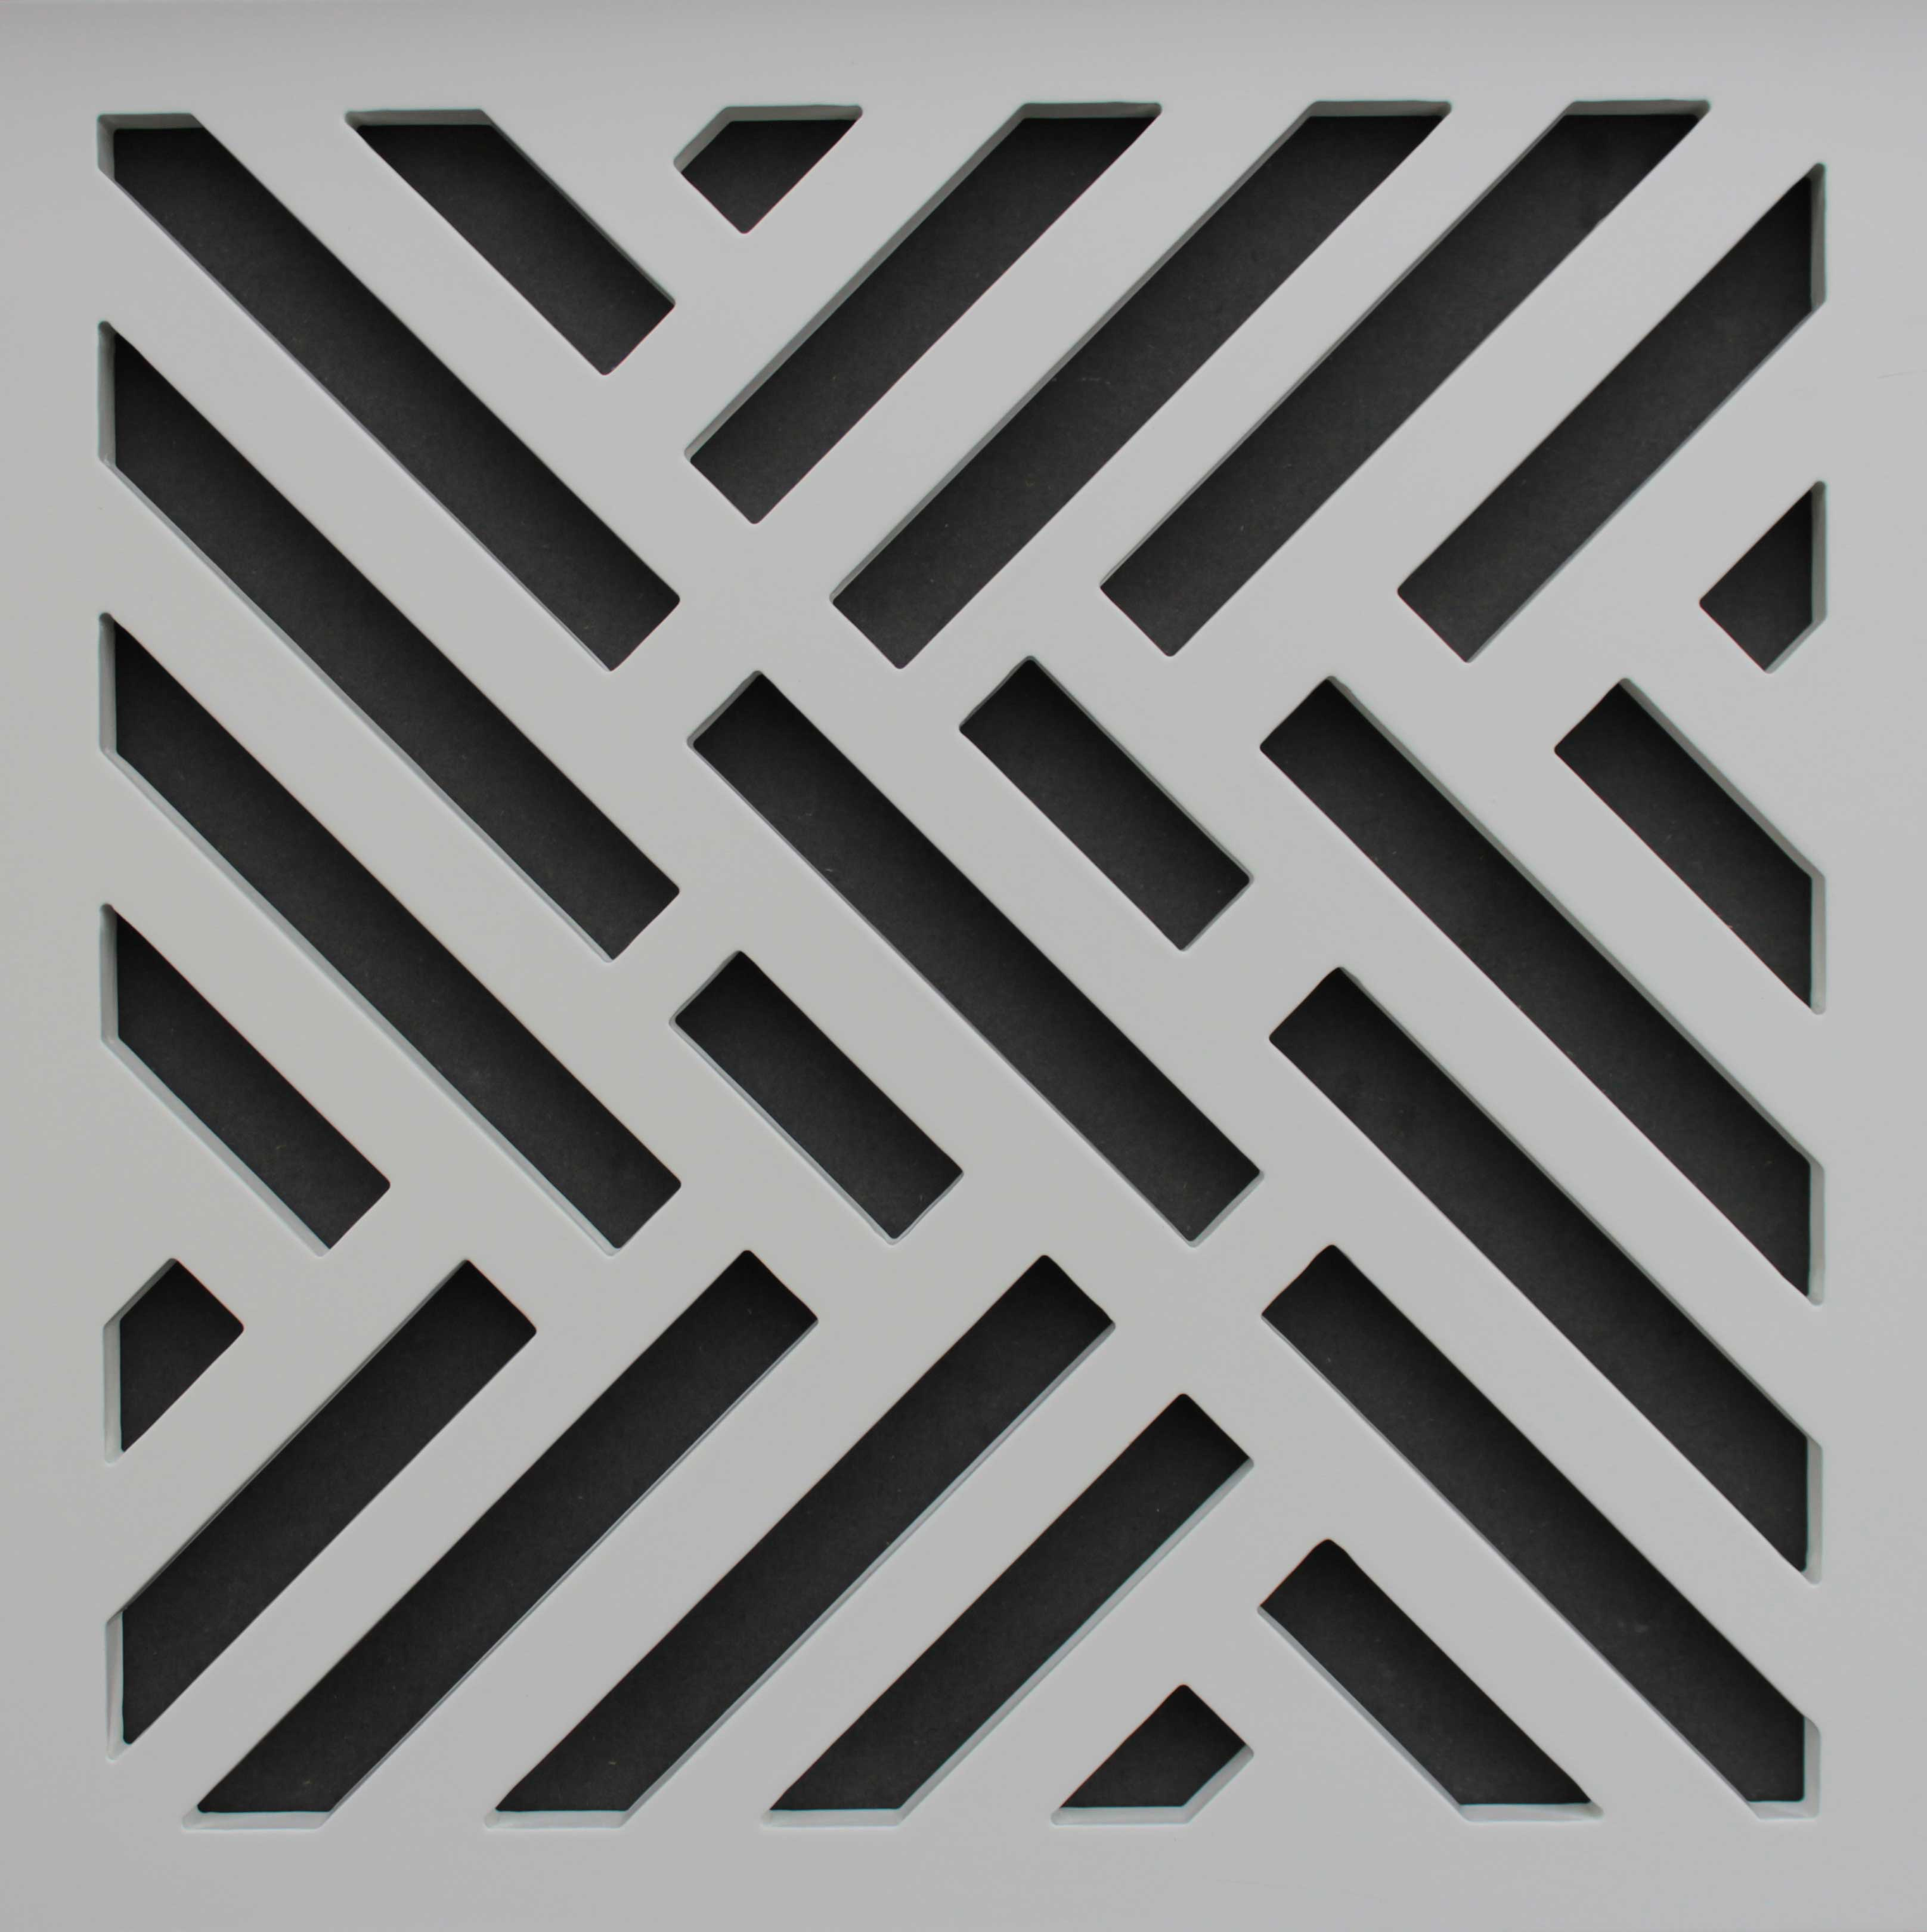 trennwand-domino-vertikal-mdf-weis